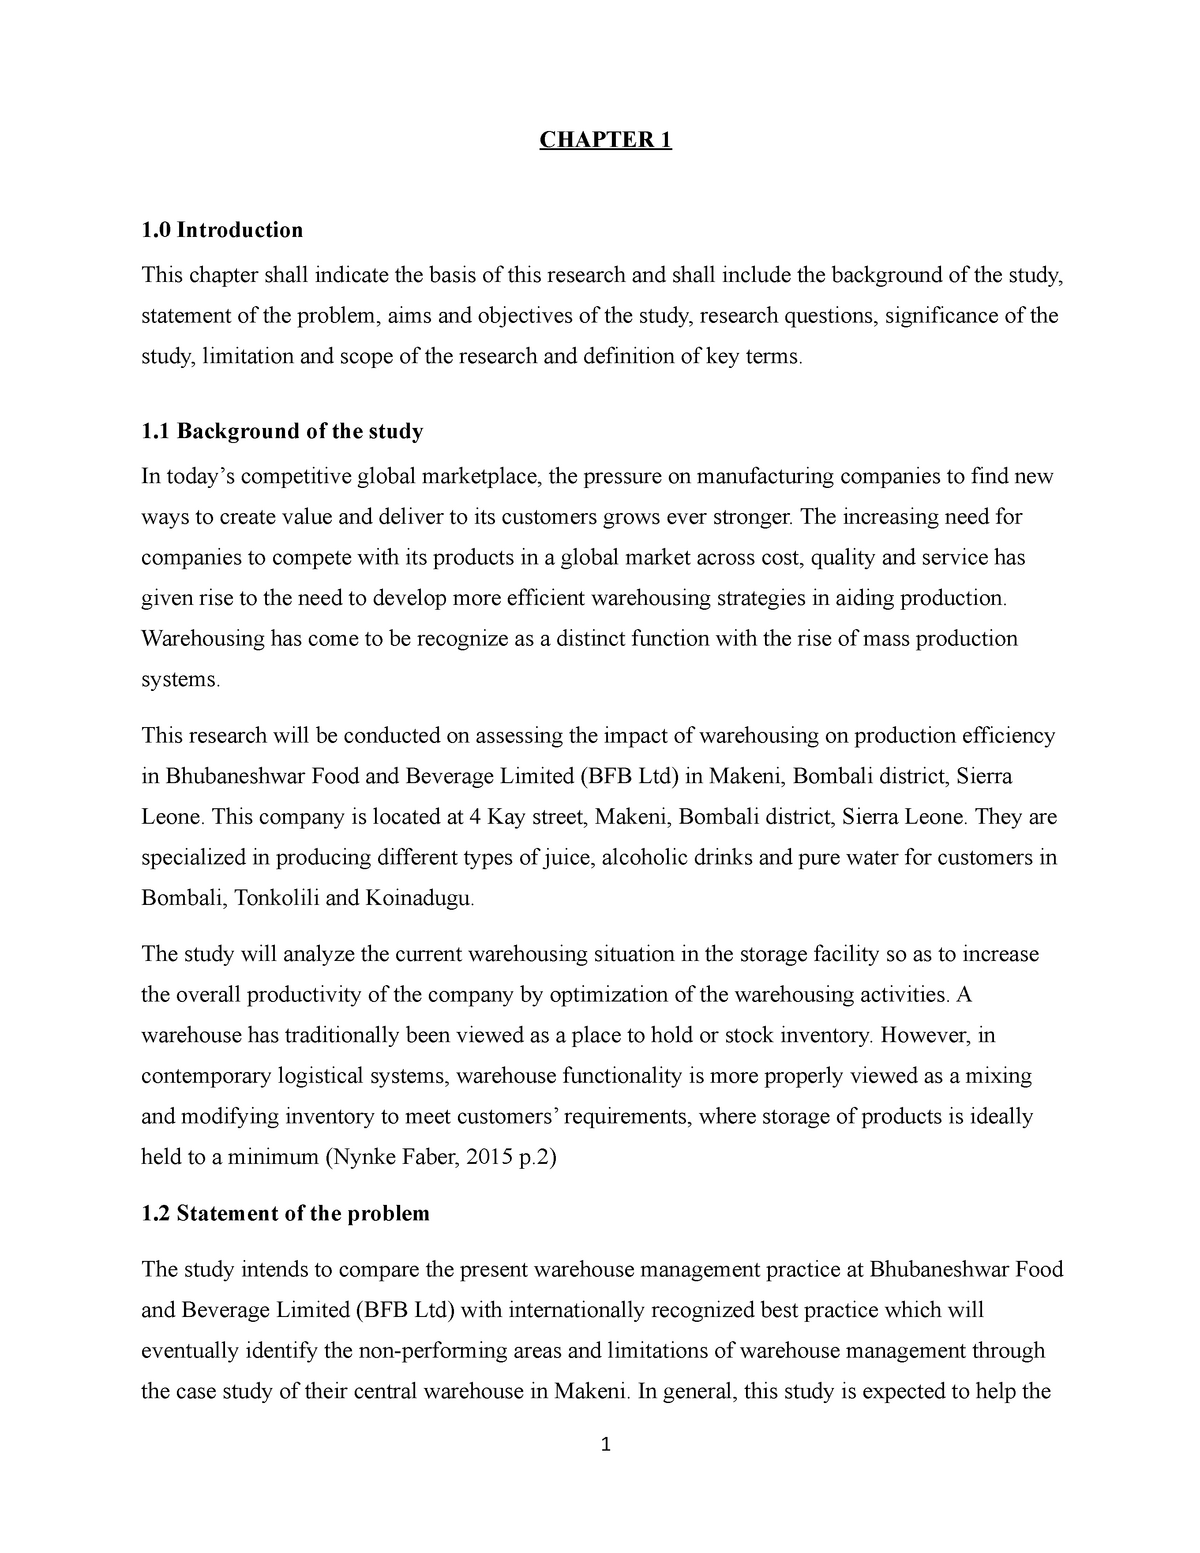 Research Proposal - Ishmael Aib Samura - PLSCM - StuDocu